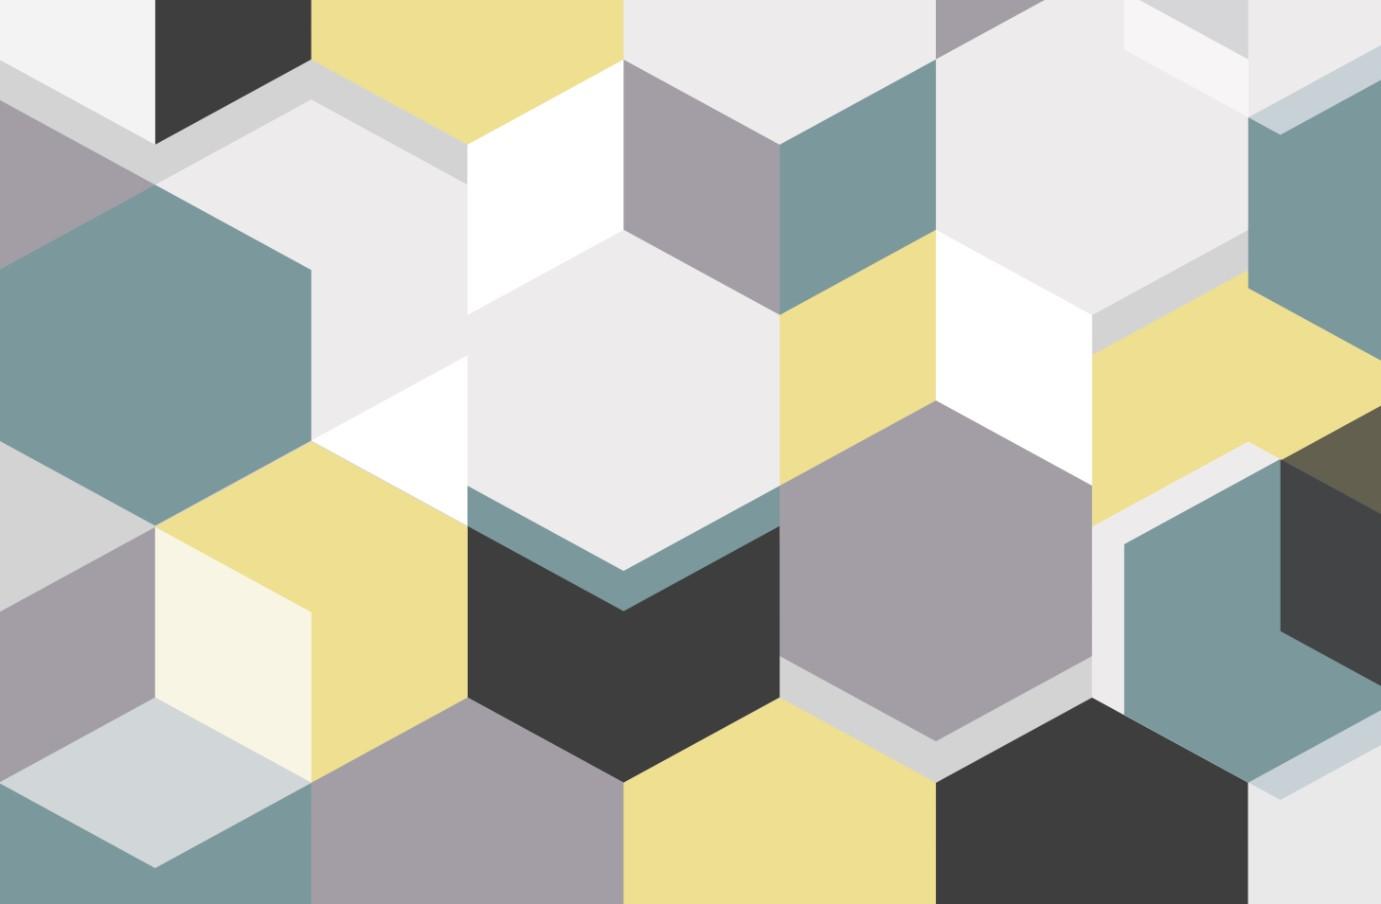 Фоны и текстуры - 24 | Wall-Style